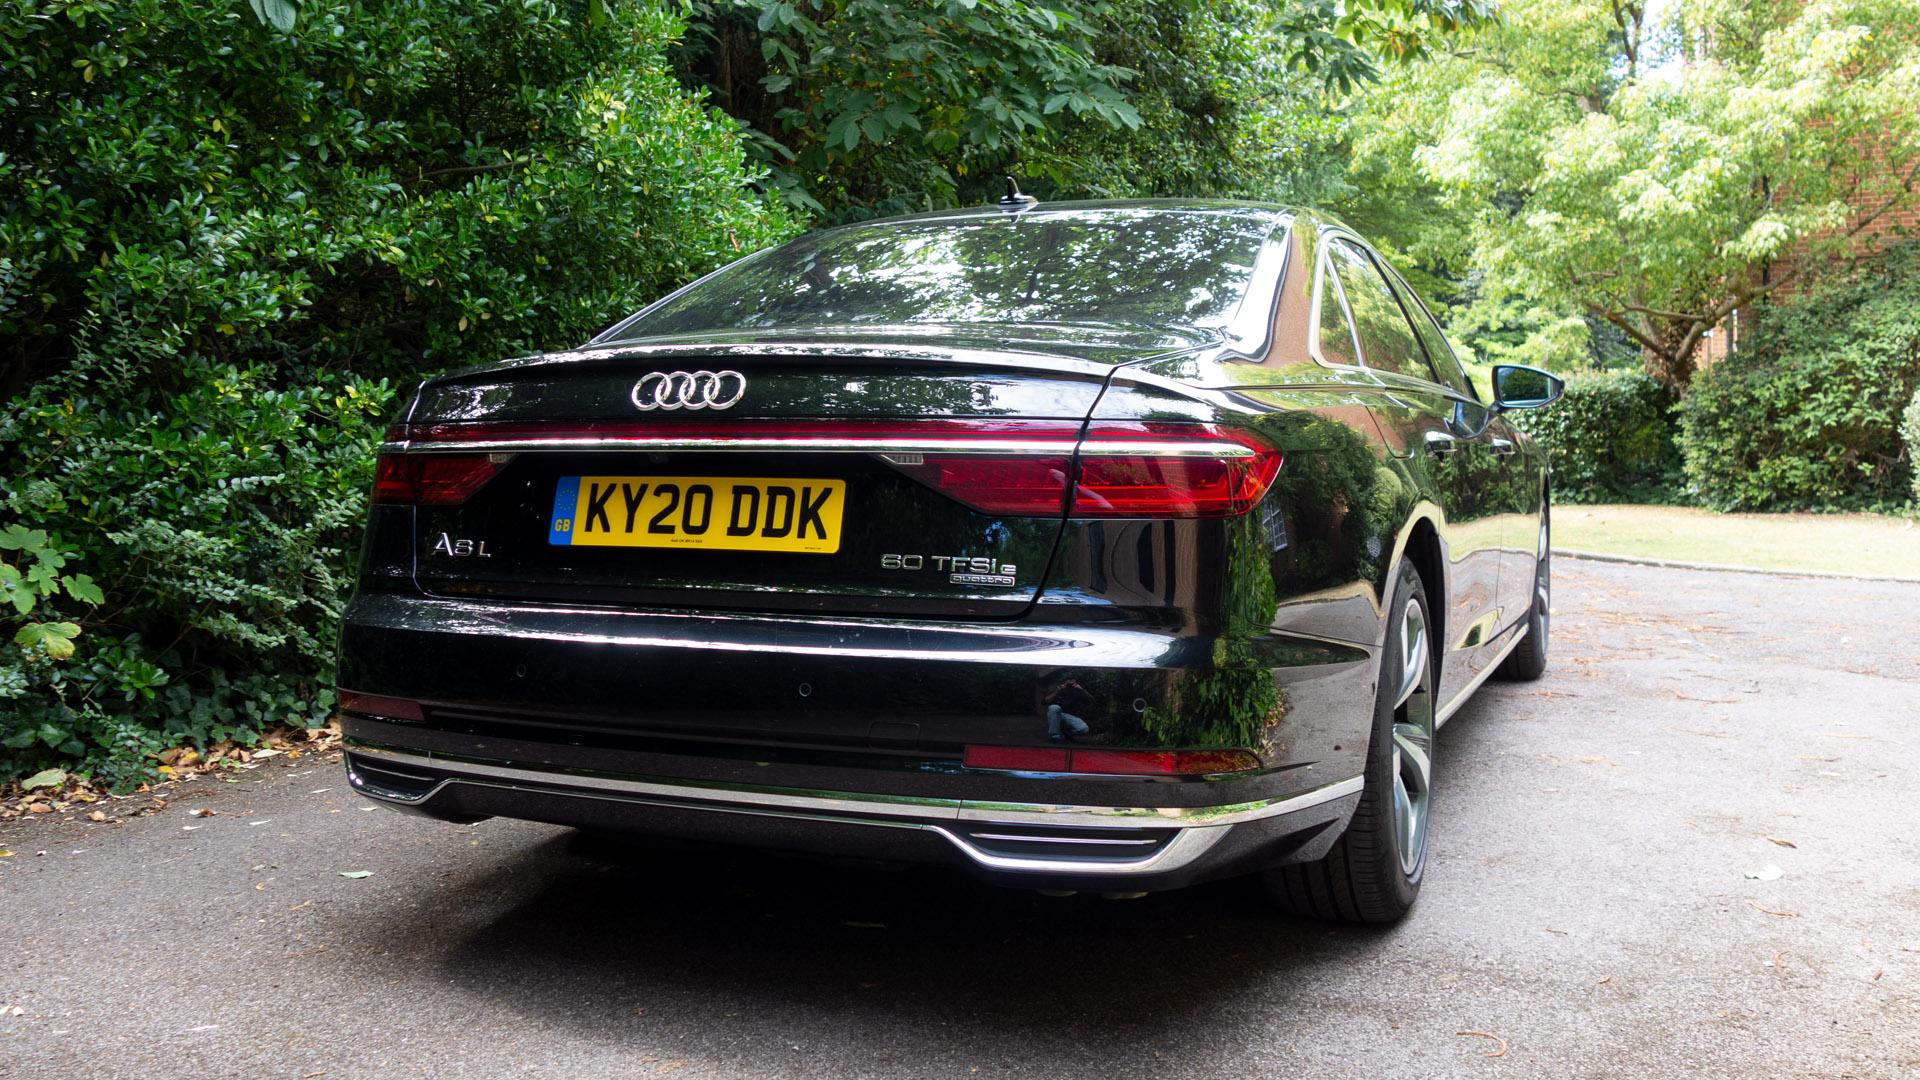 Audi A8 rear design